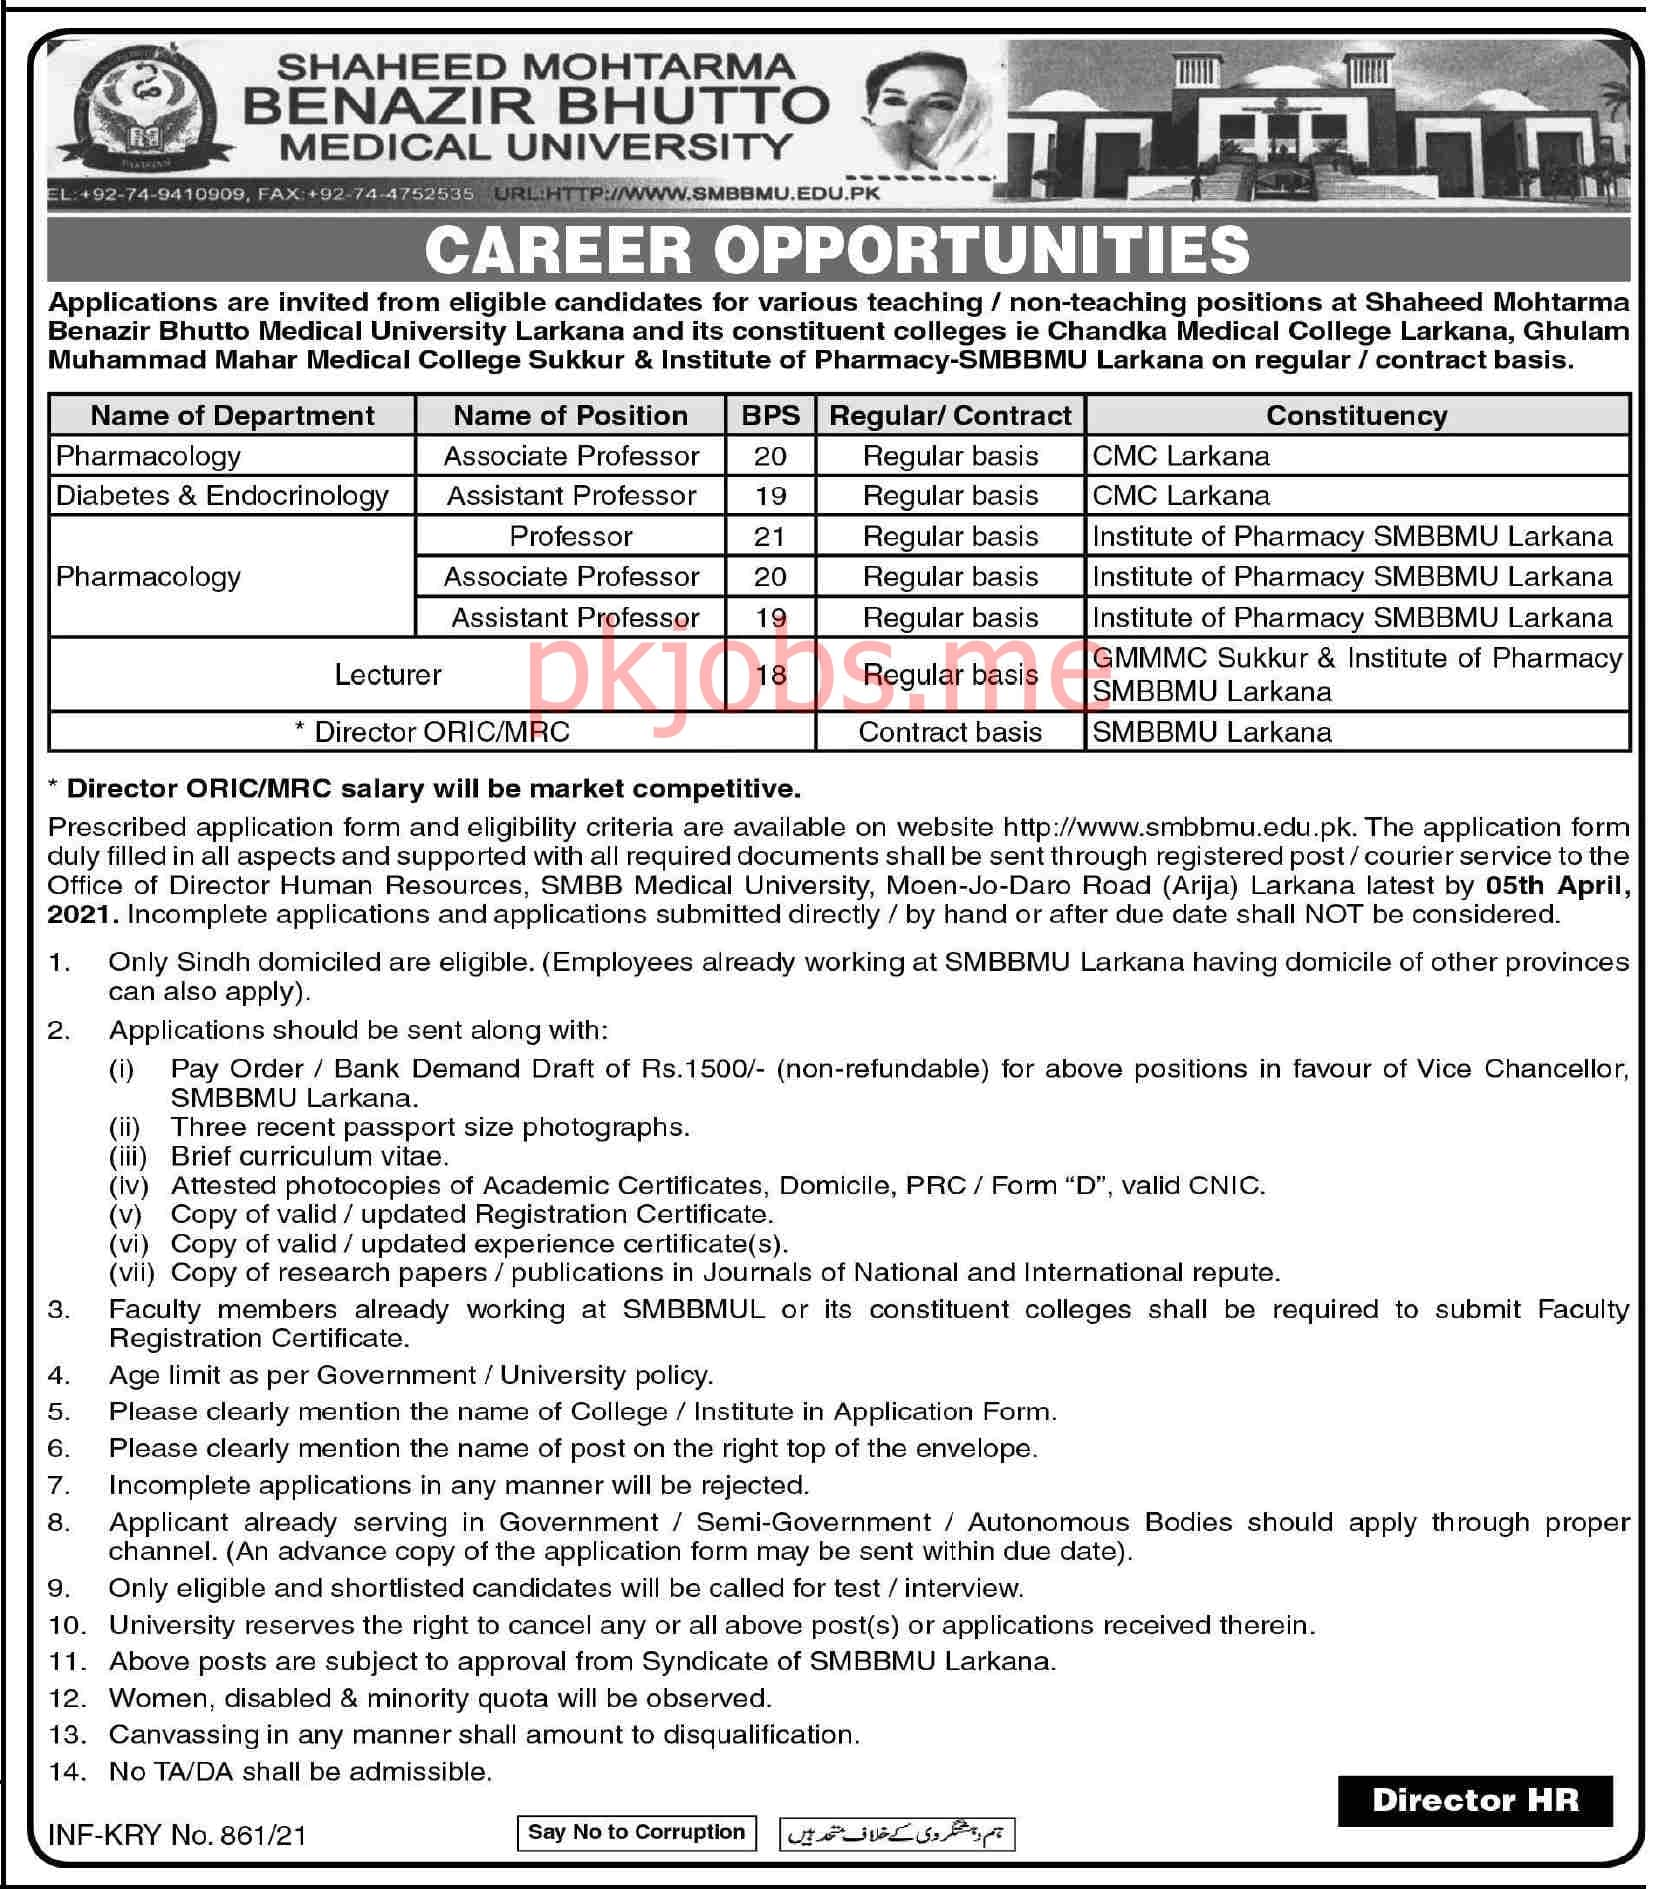 Latest Shaheed Mohtarma Benazir Bhutto Medical University Posts 2021